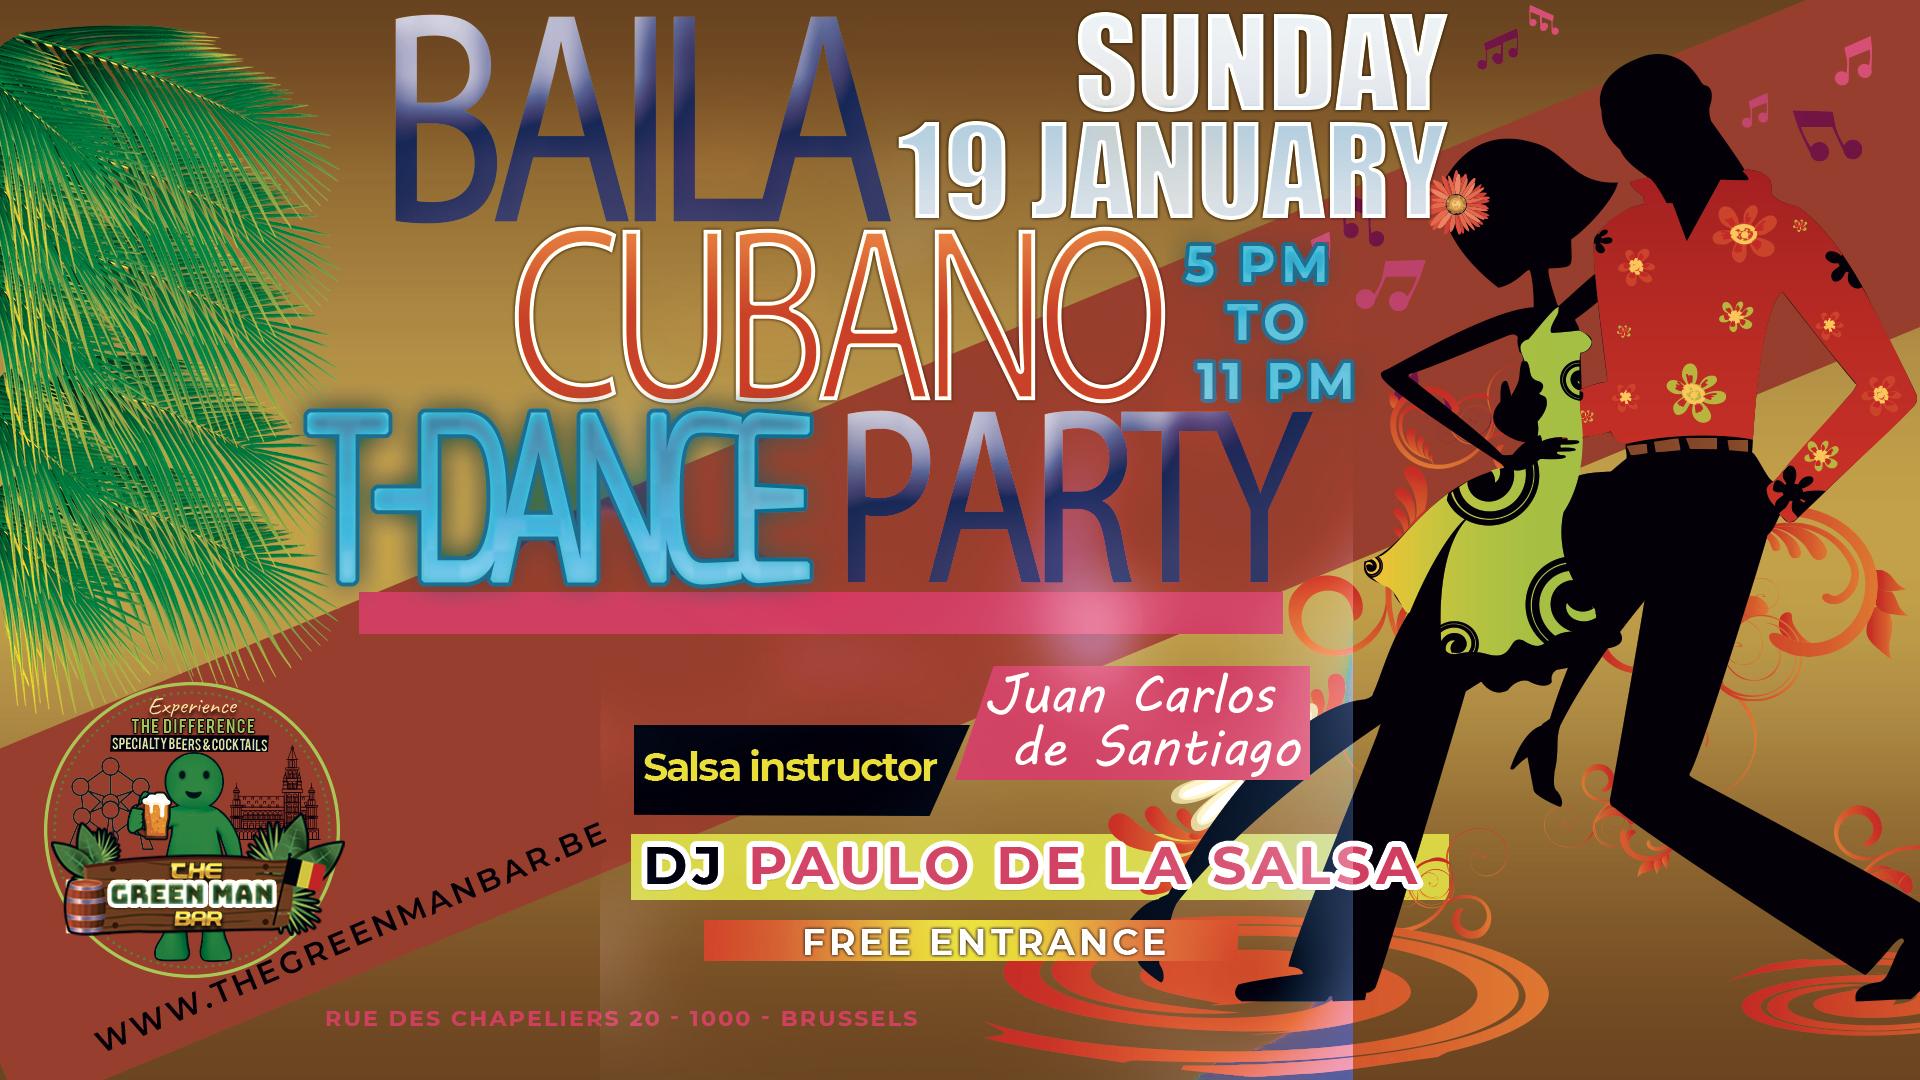 Baila Cubano Party with Dj Paulo De La Salsa – Sunday 26 JAN – 5 PM